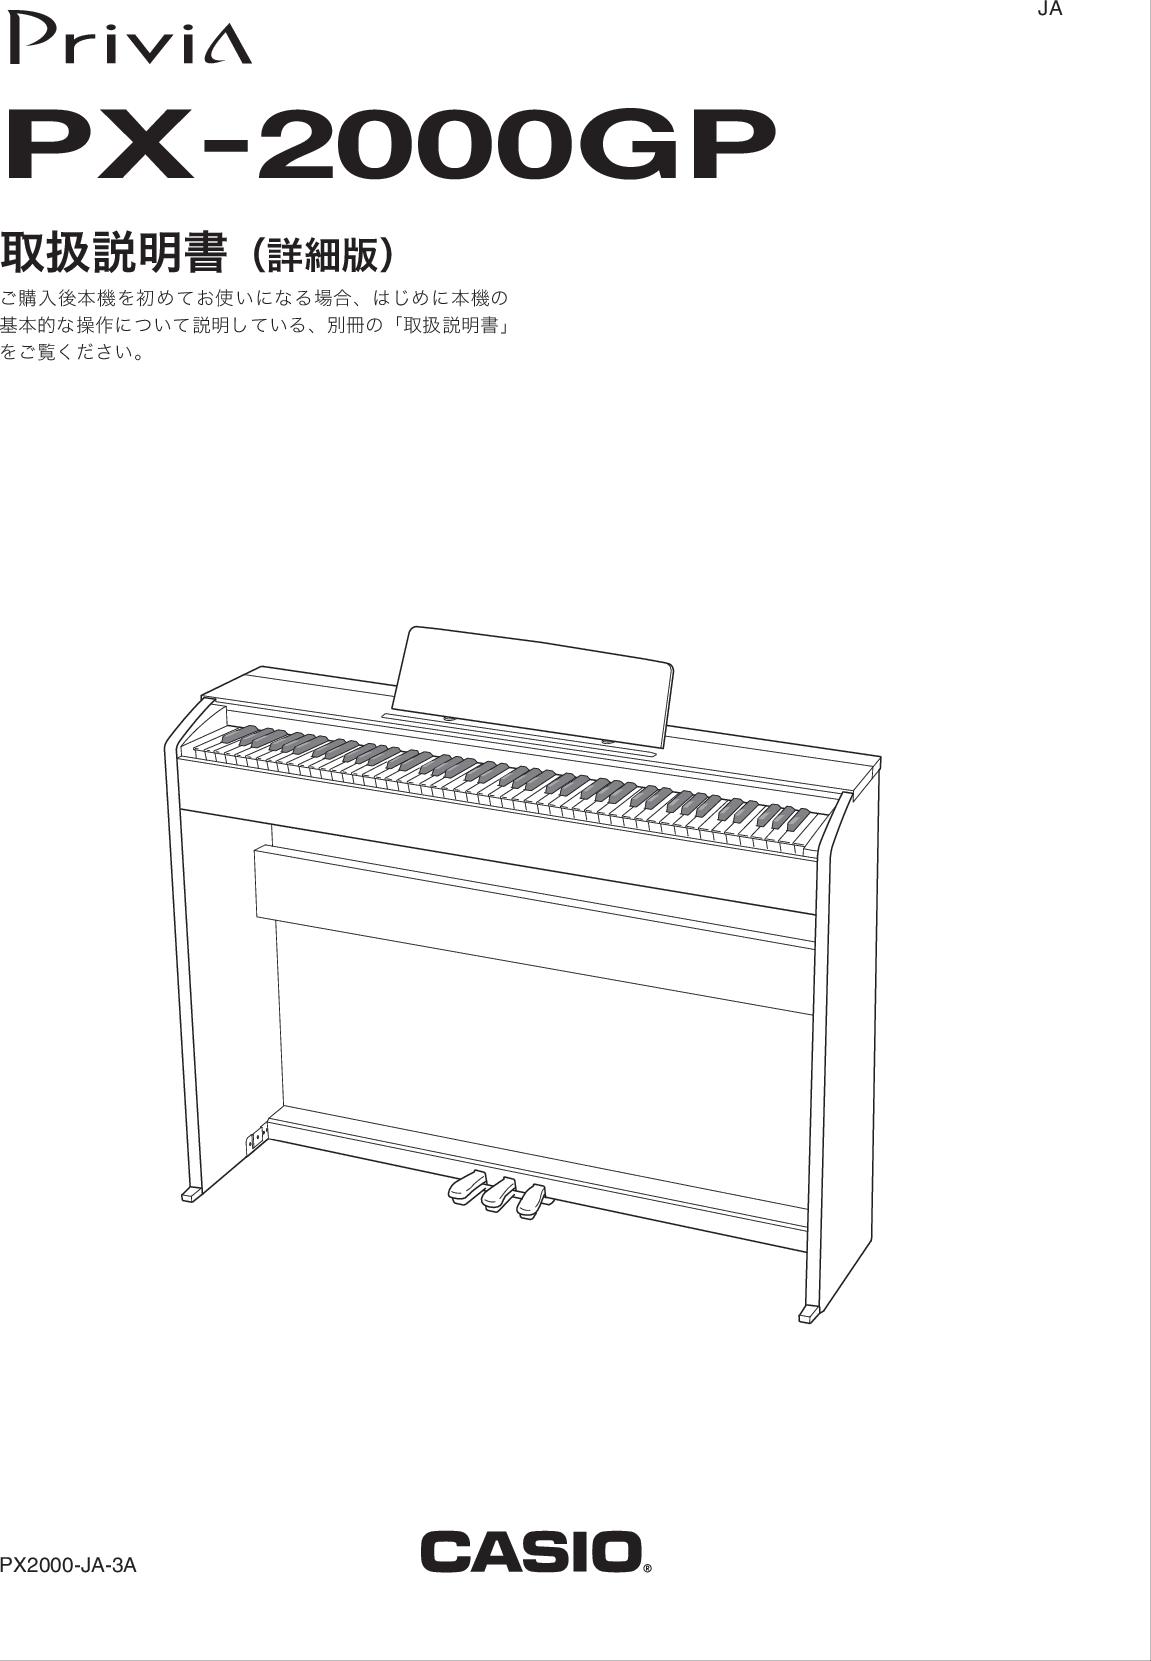 Casio PX2000GP_JA PX 2000GP取扱説明書(詳細版) Web PX2000 JA 3A